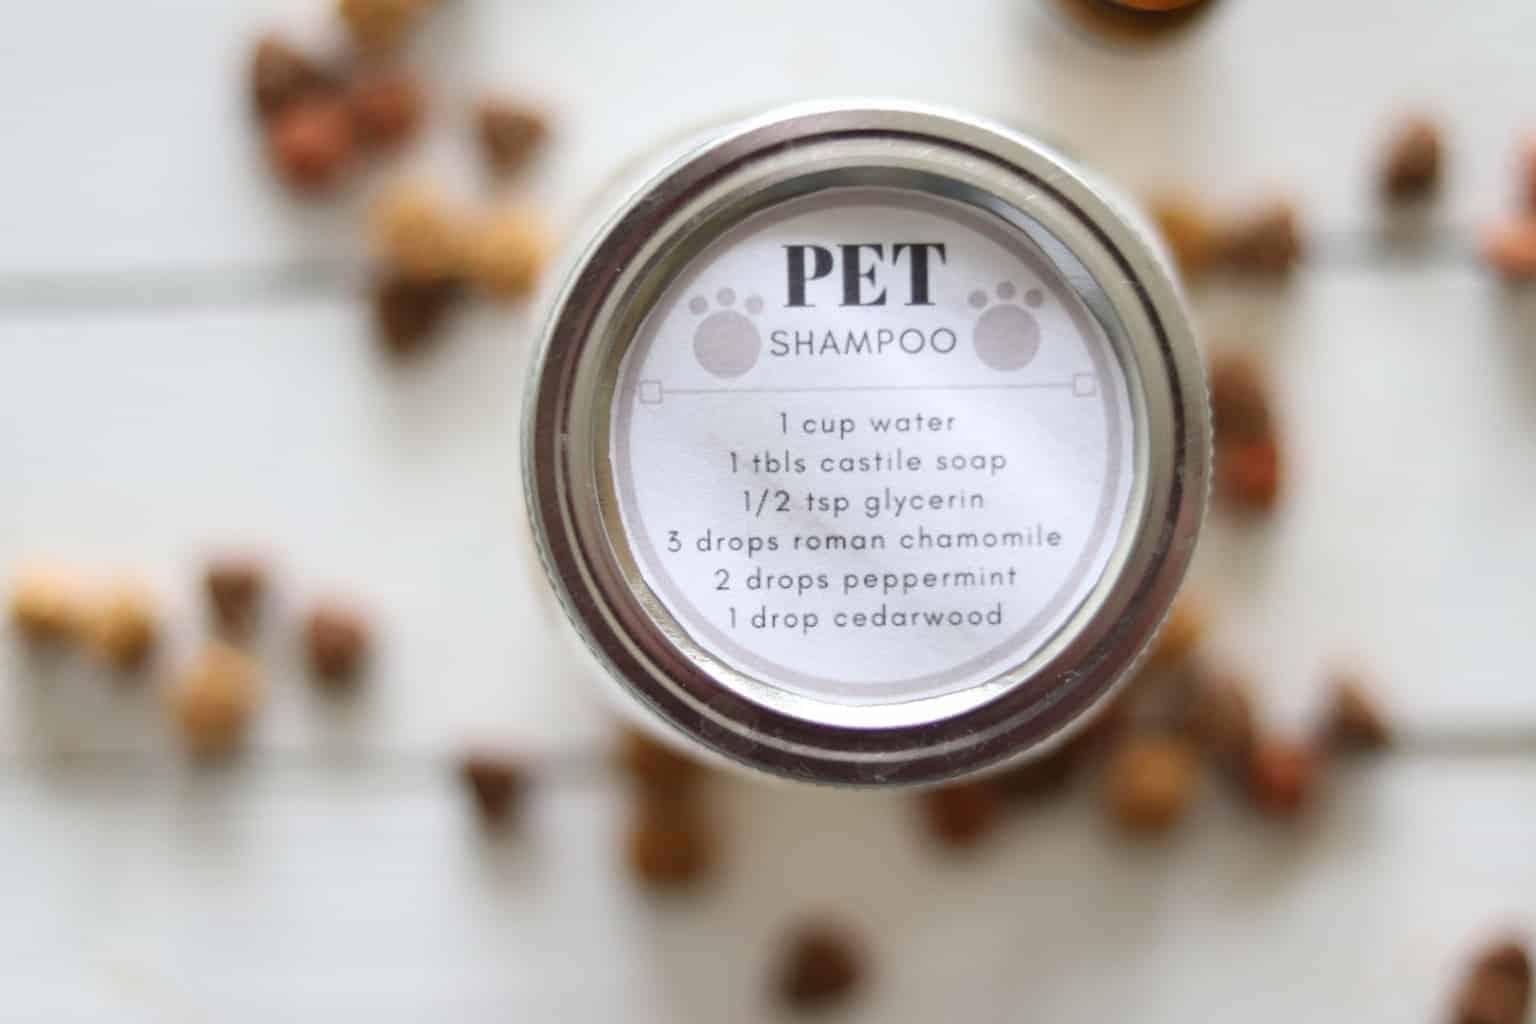 DIY pet shampoo recipe on small mason jar.